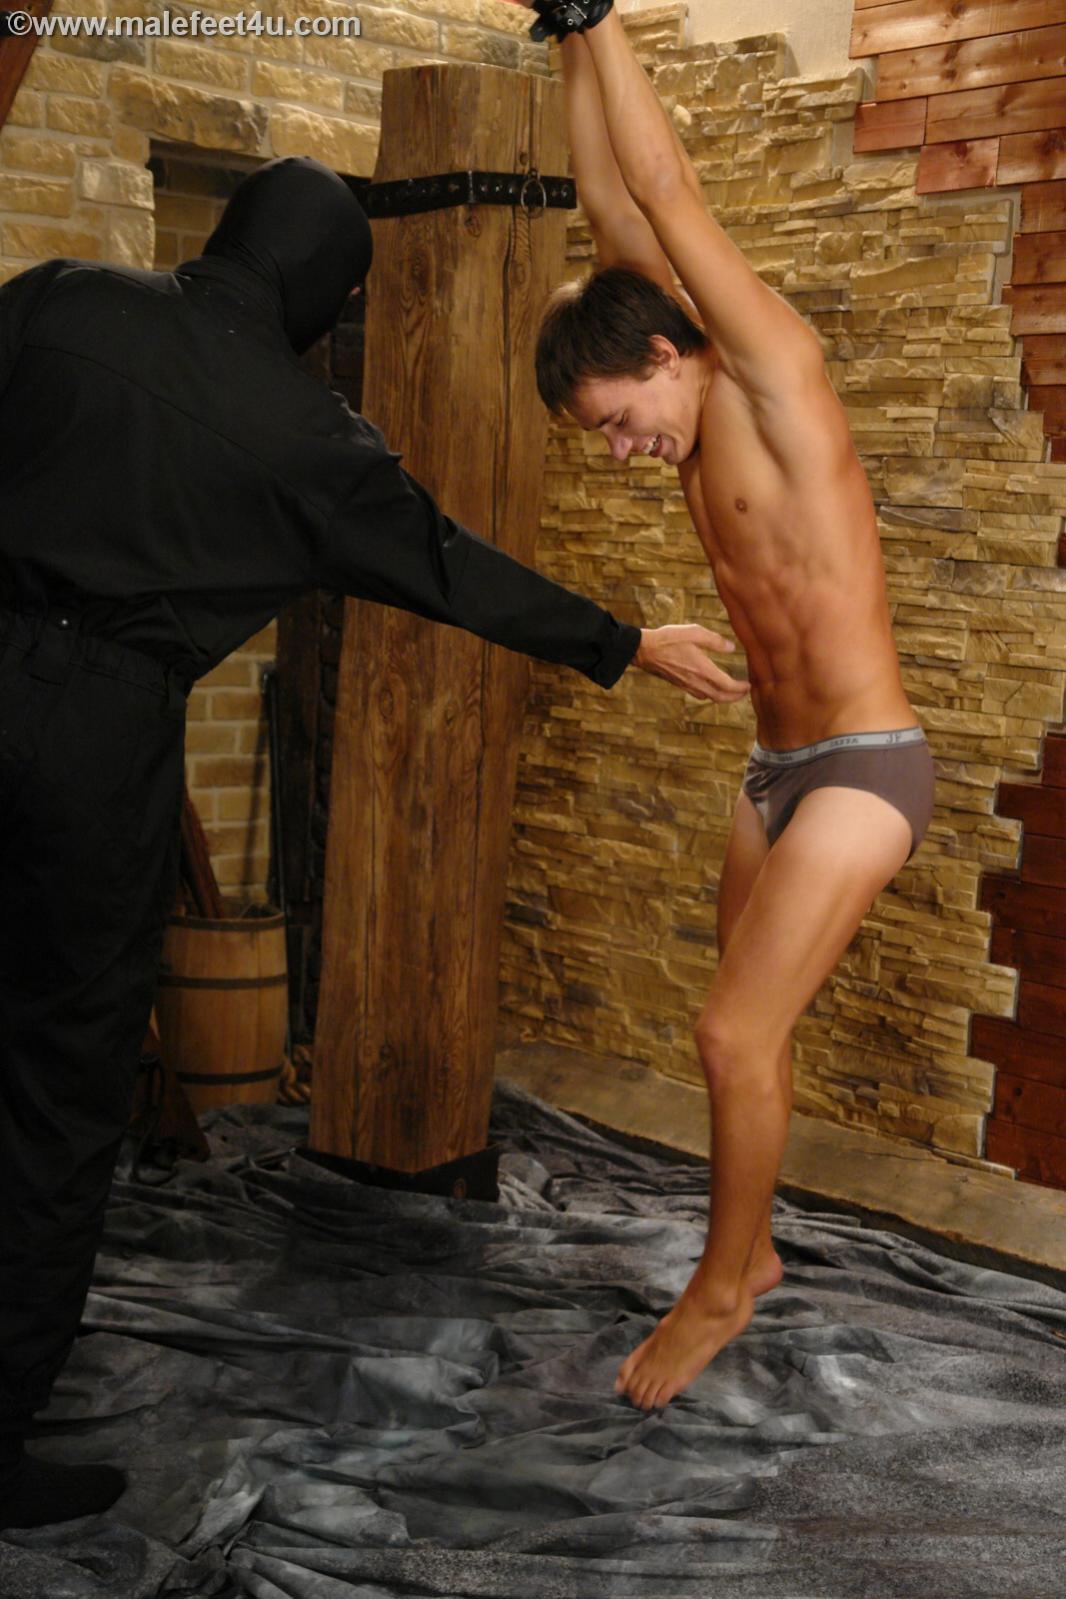 Boy tied naked